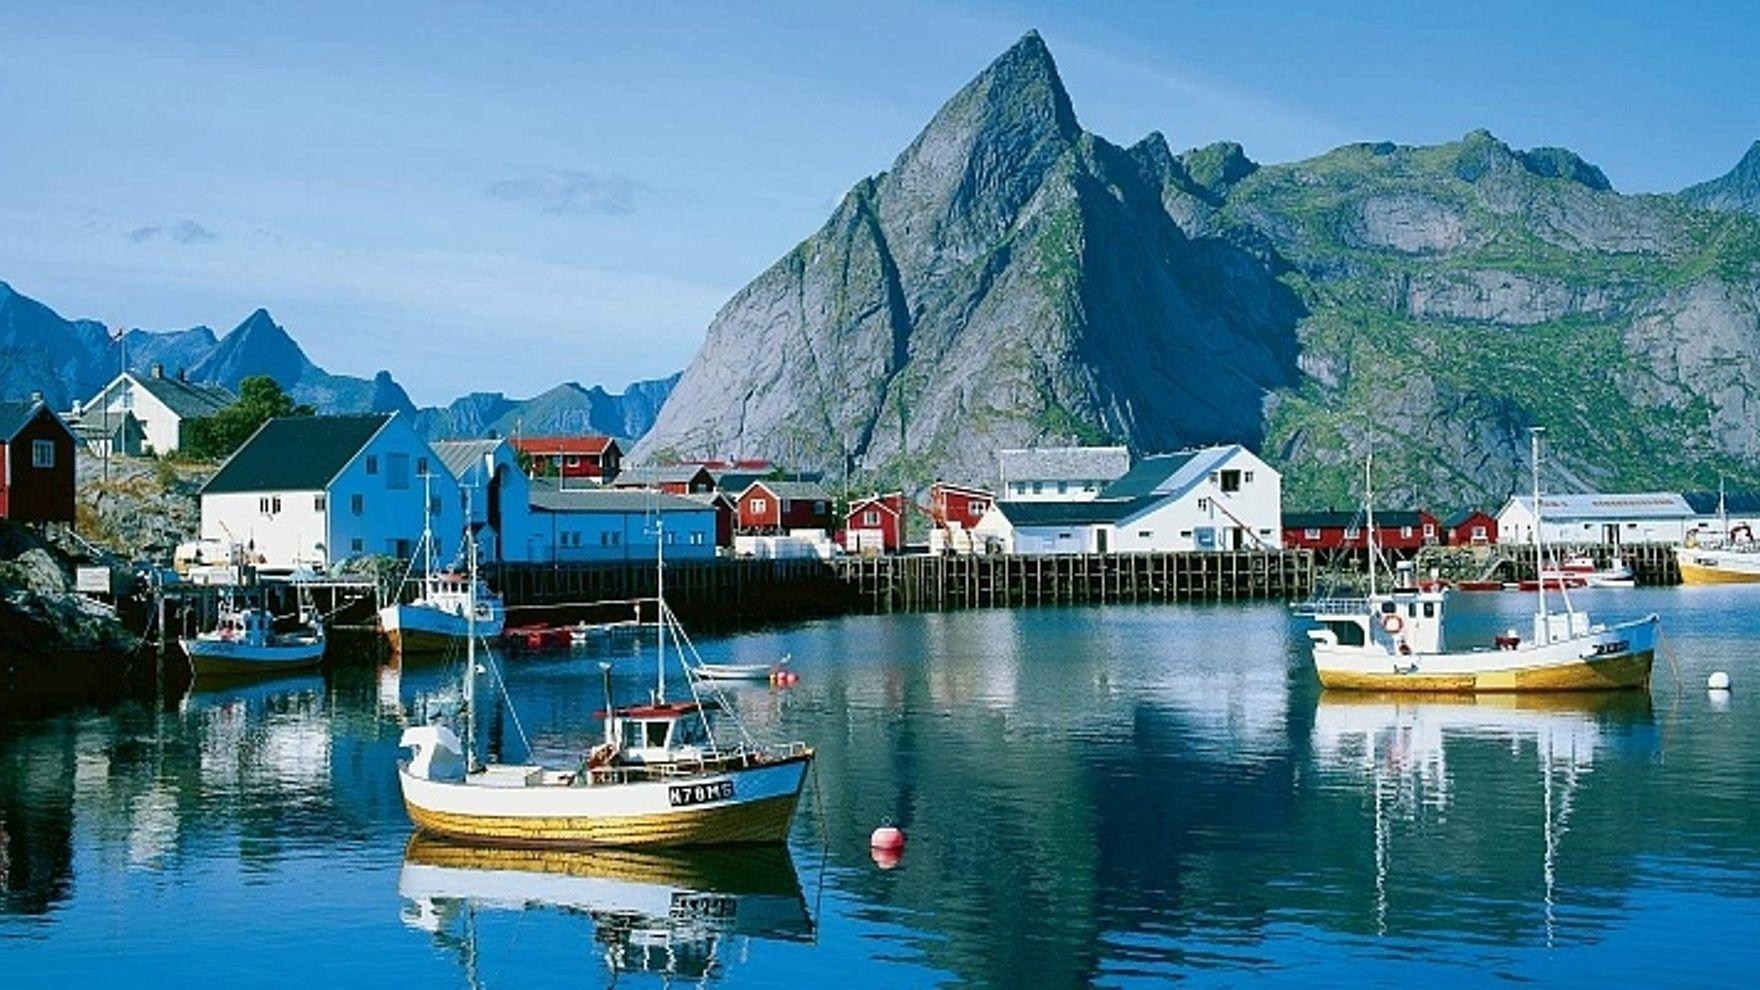 The Lofoten Islands cruise in Norway